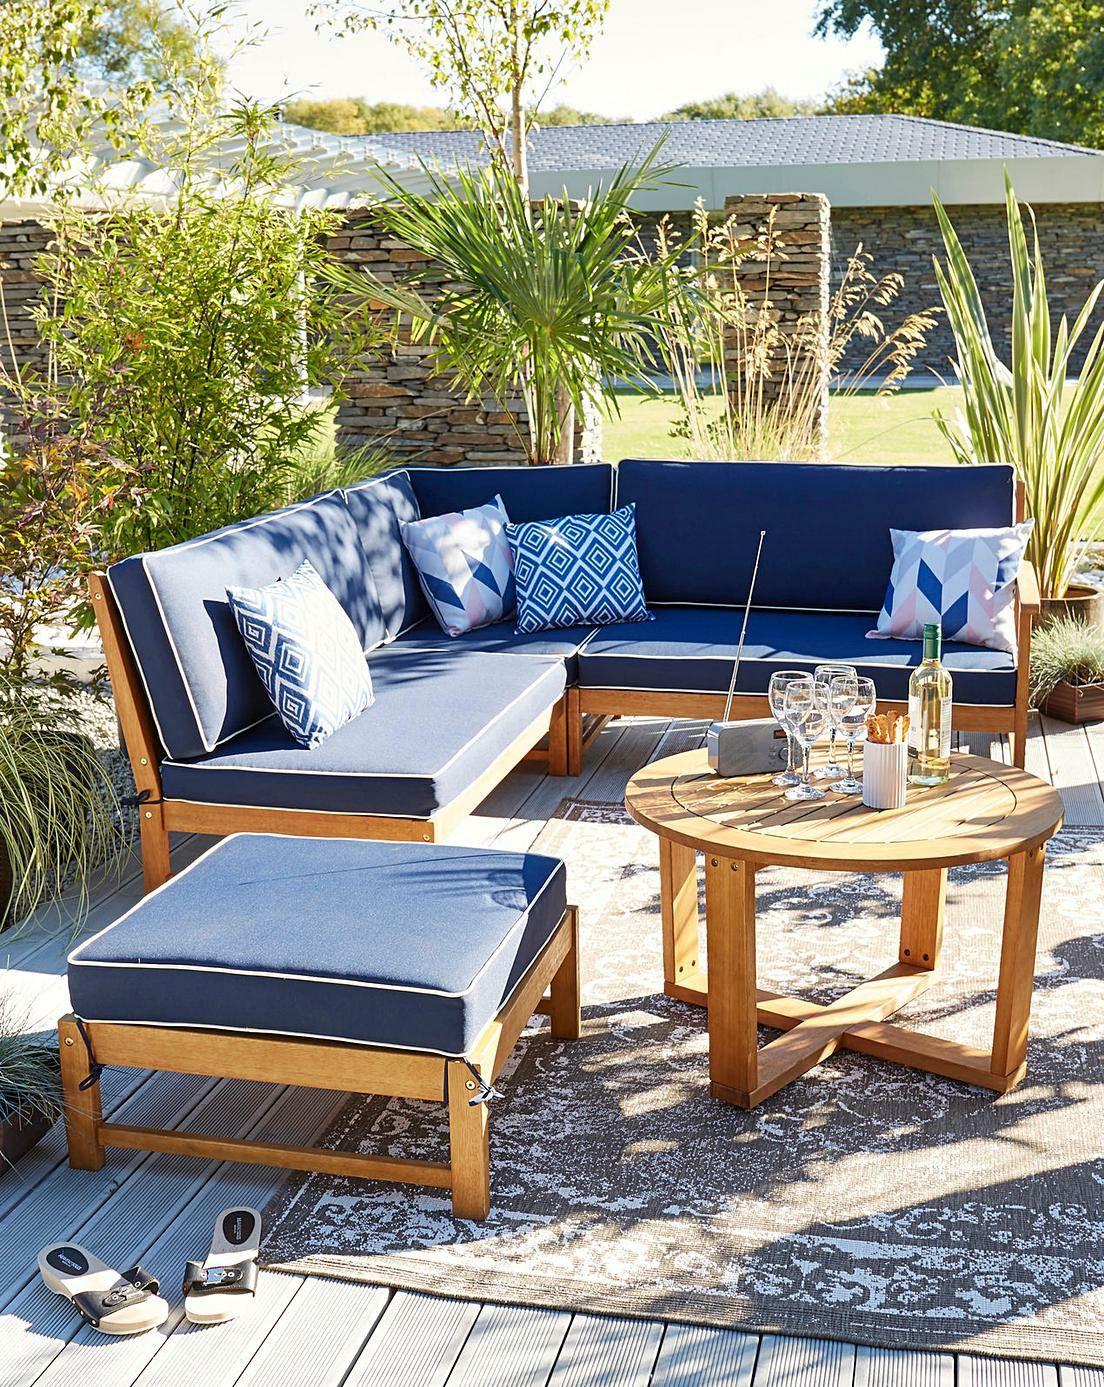 Buy Collection 5 Seater Aluminium Corner Sofa Set Garden Table And Chair Sets Argos Corner Sofa Set Wooden Garden Furniture Corner Sofa Garden